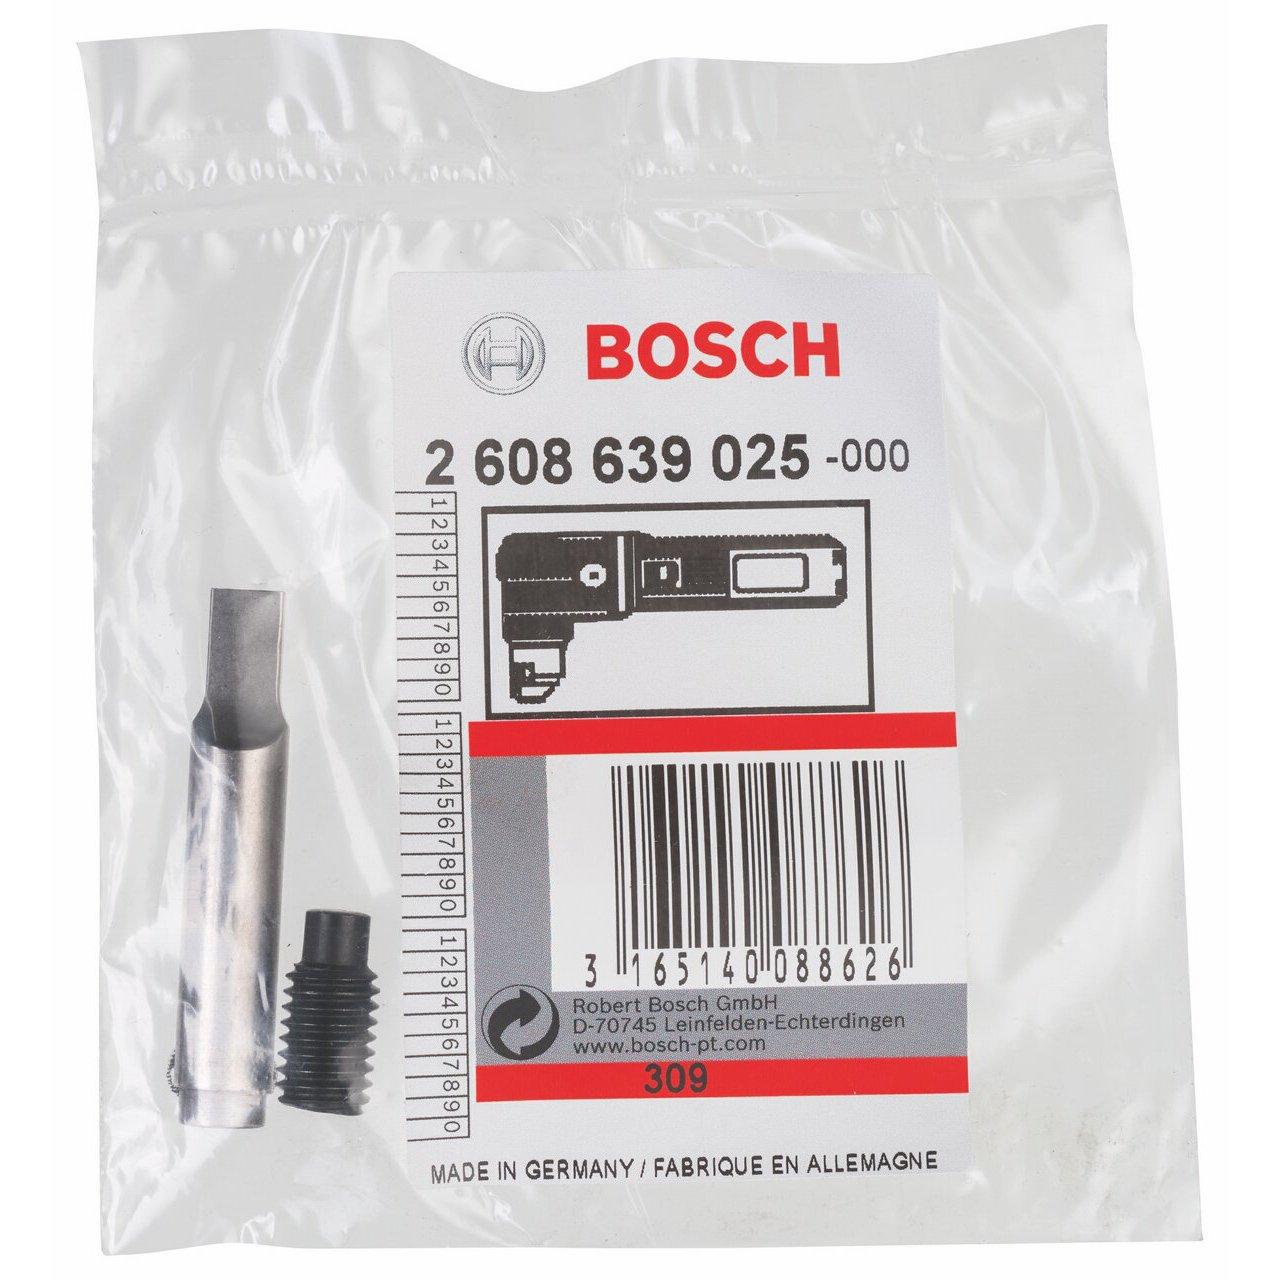 Bosch 2608639025 Nibbler Punch